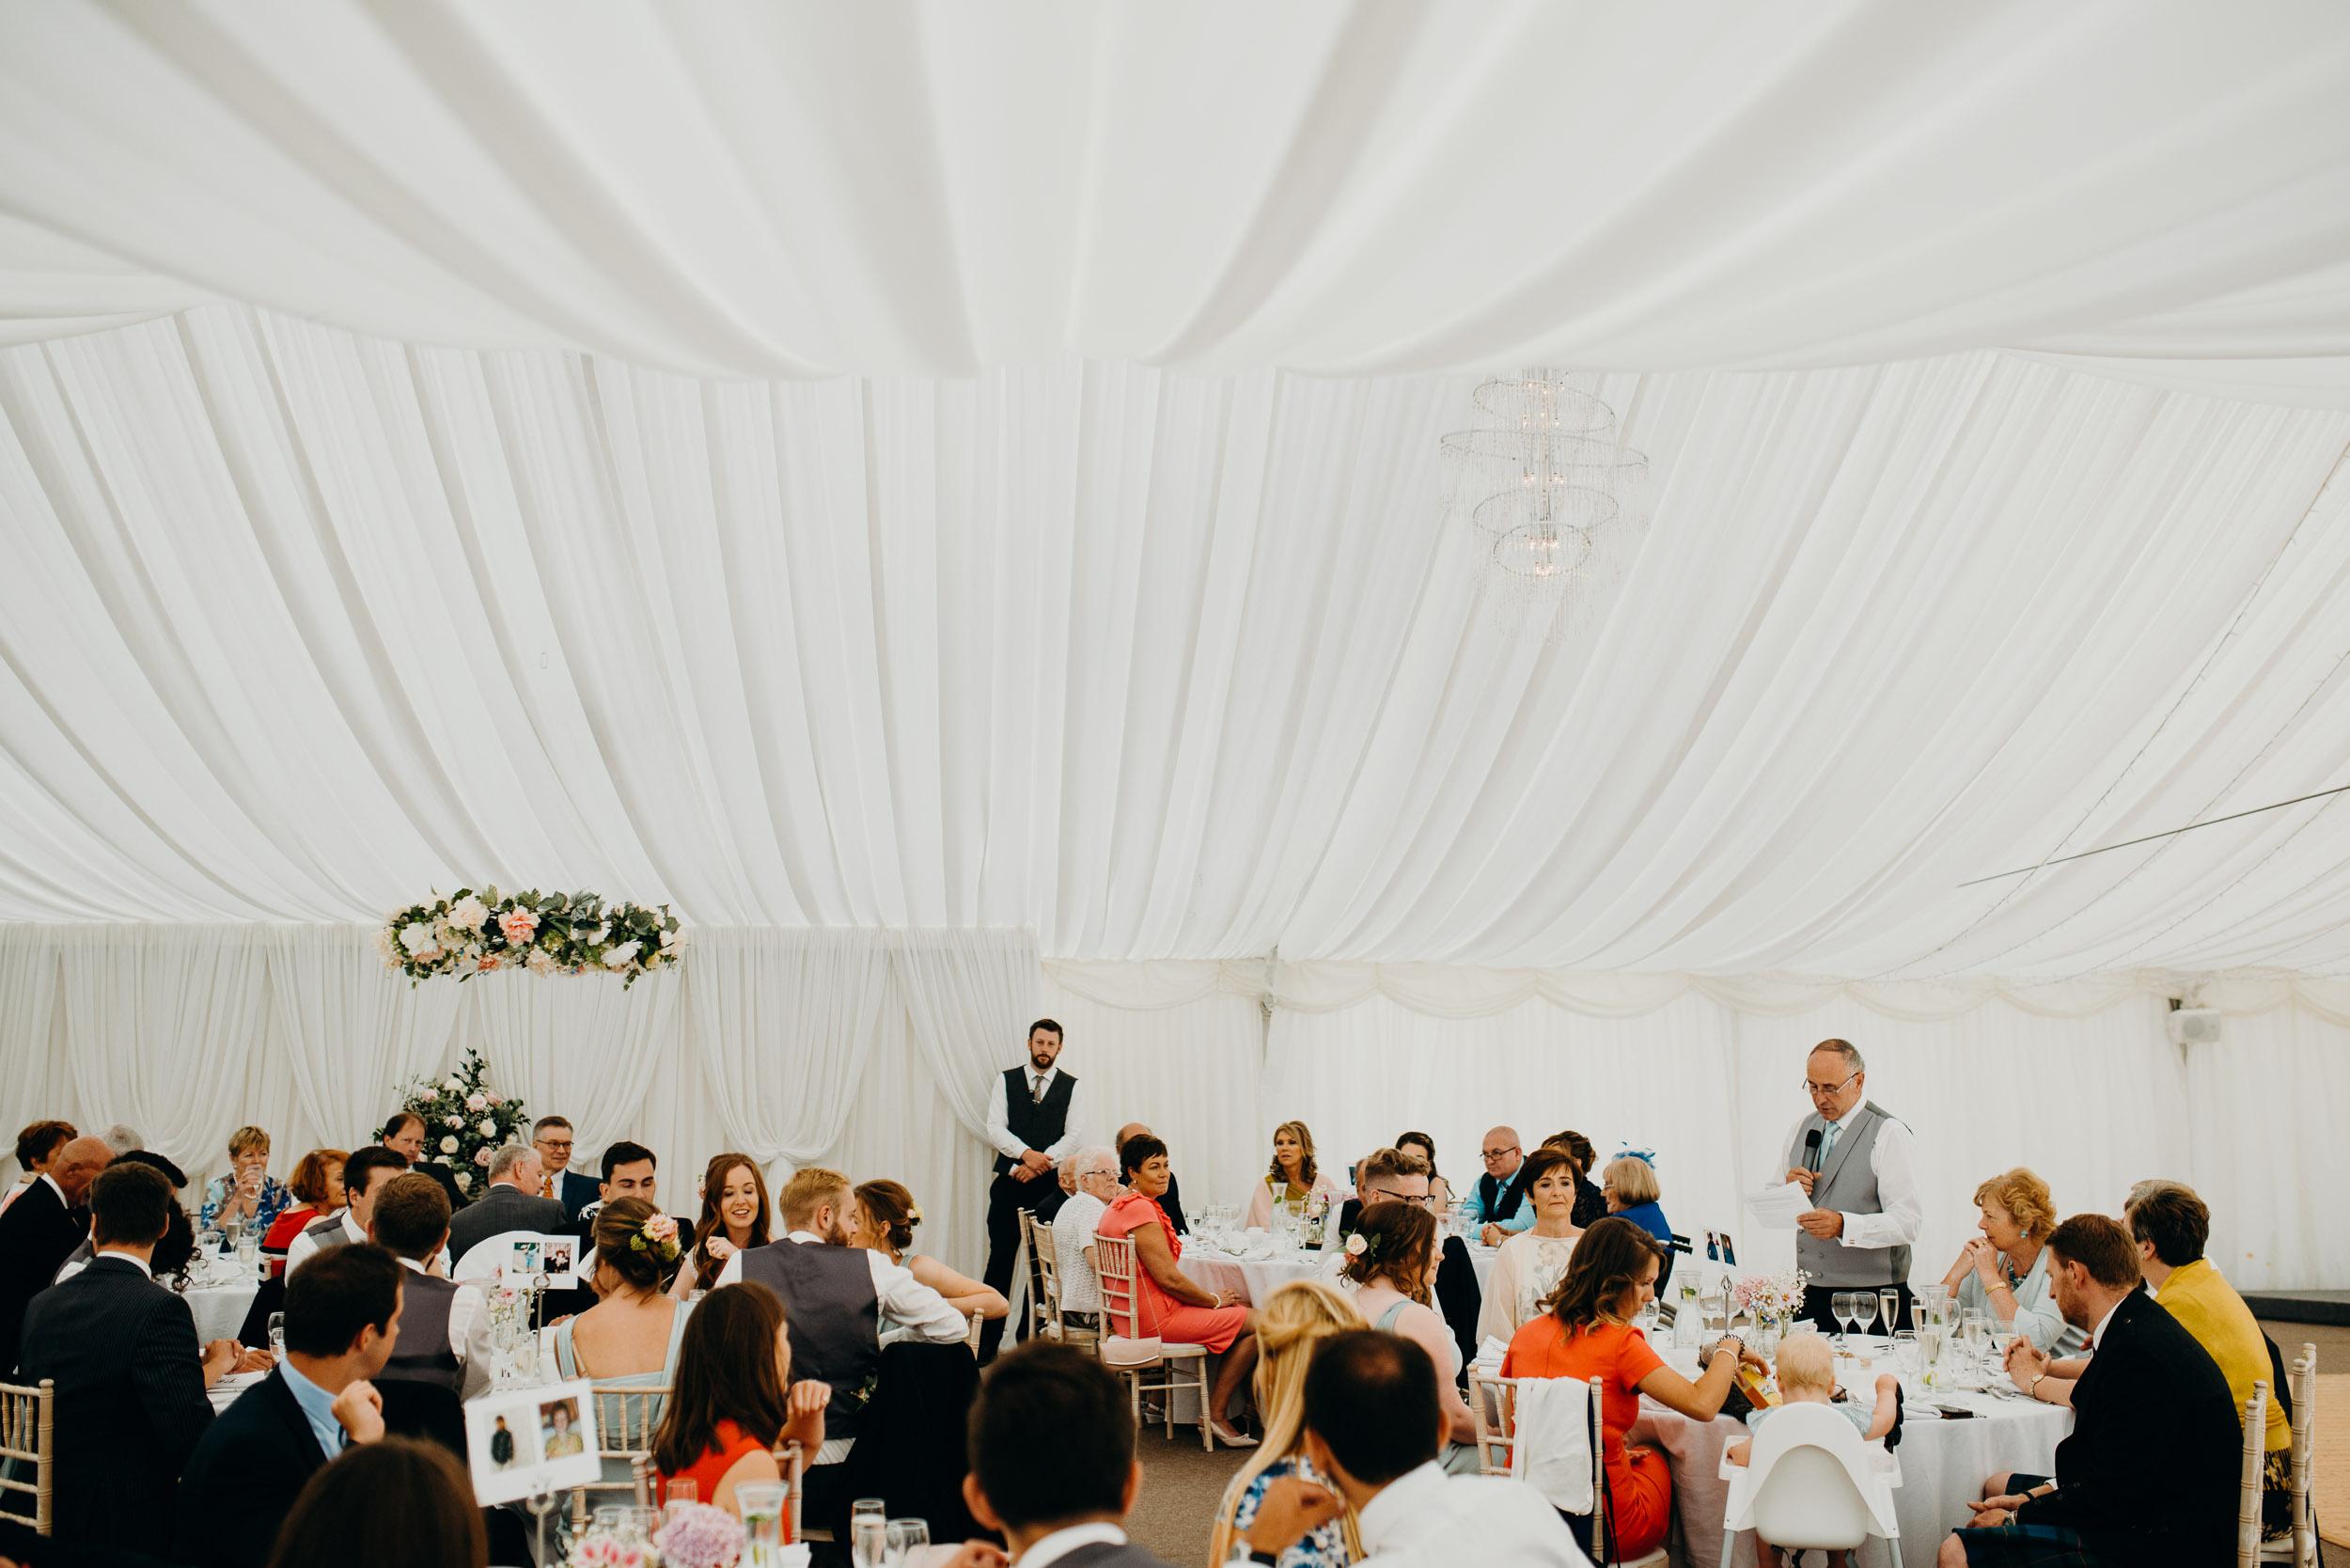 drenagh estate wedding photography-106.jpg